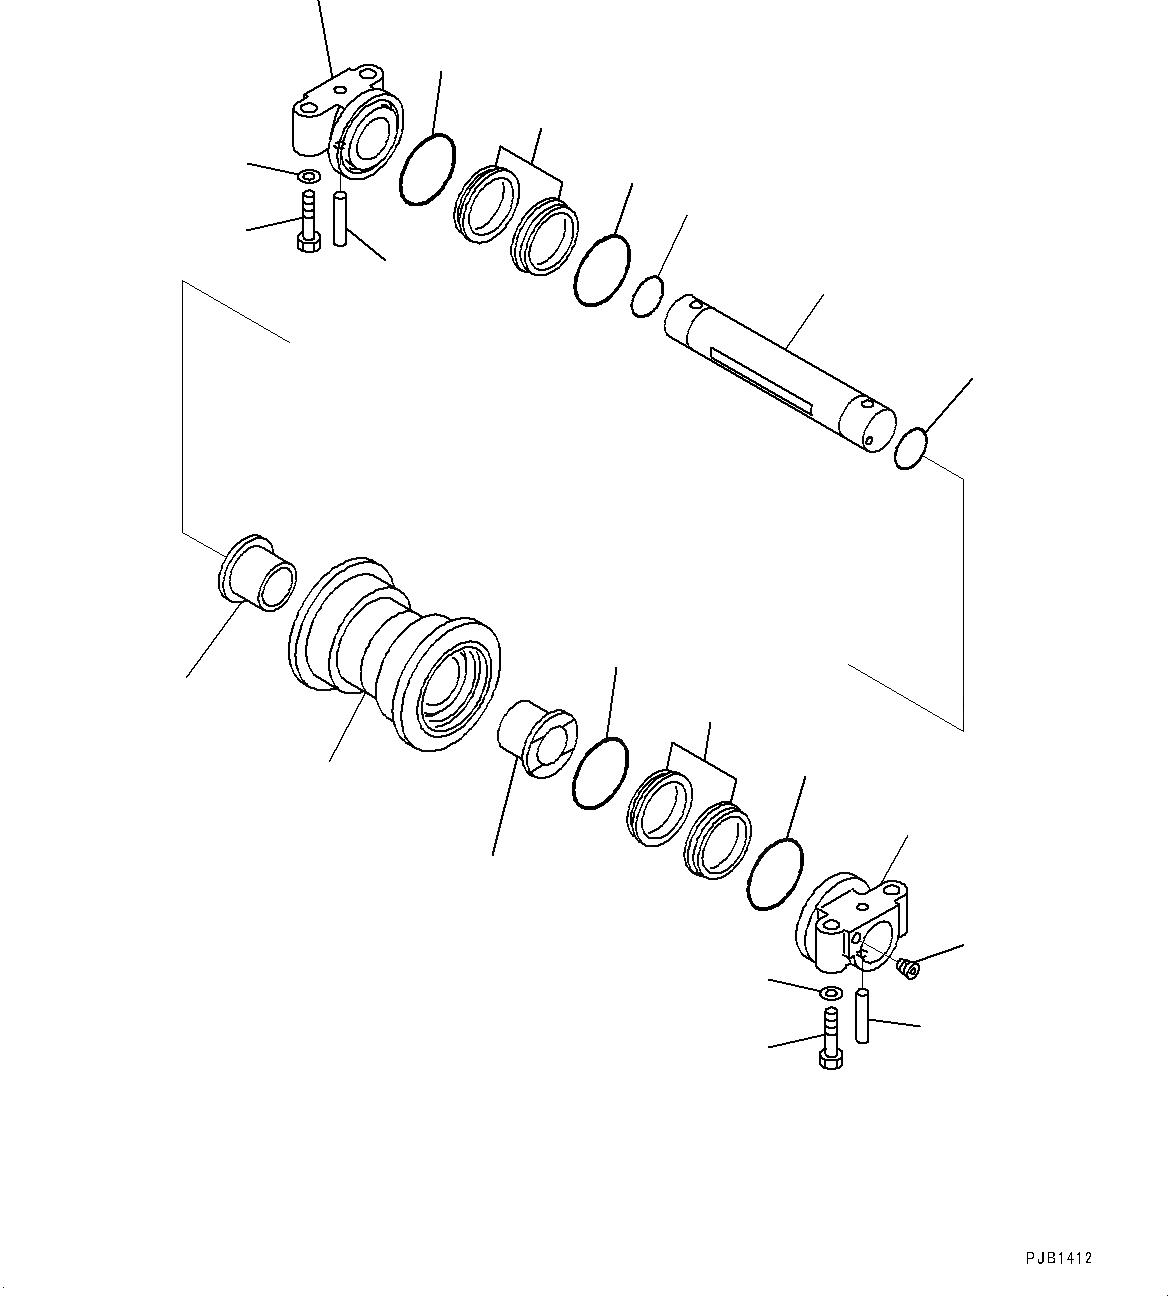 207-30-00511 Komatsu КАТОК ОПОРНЫЙ